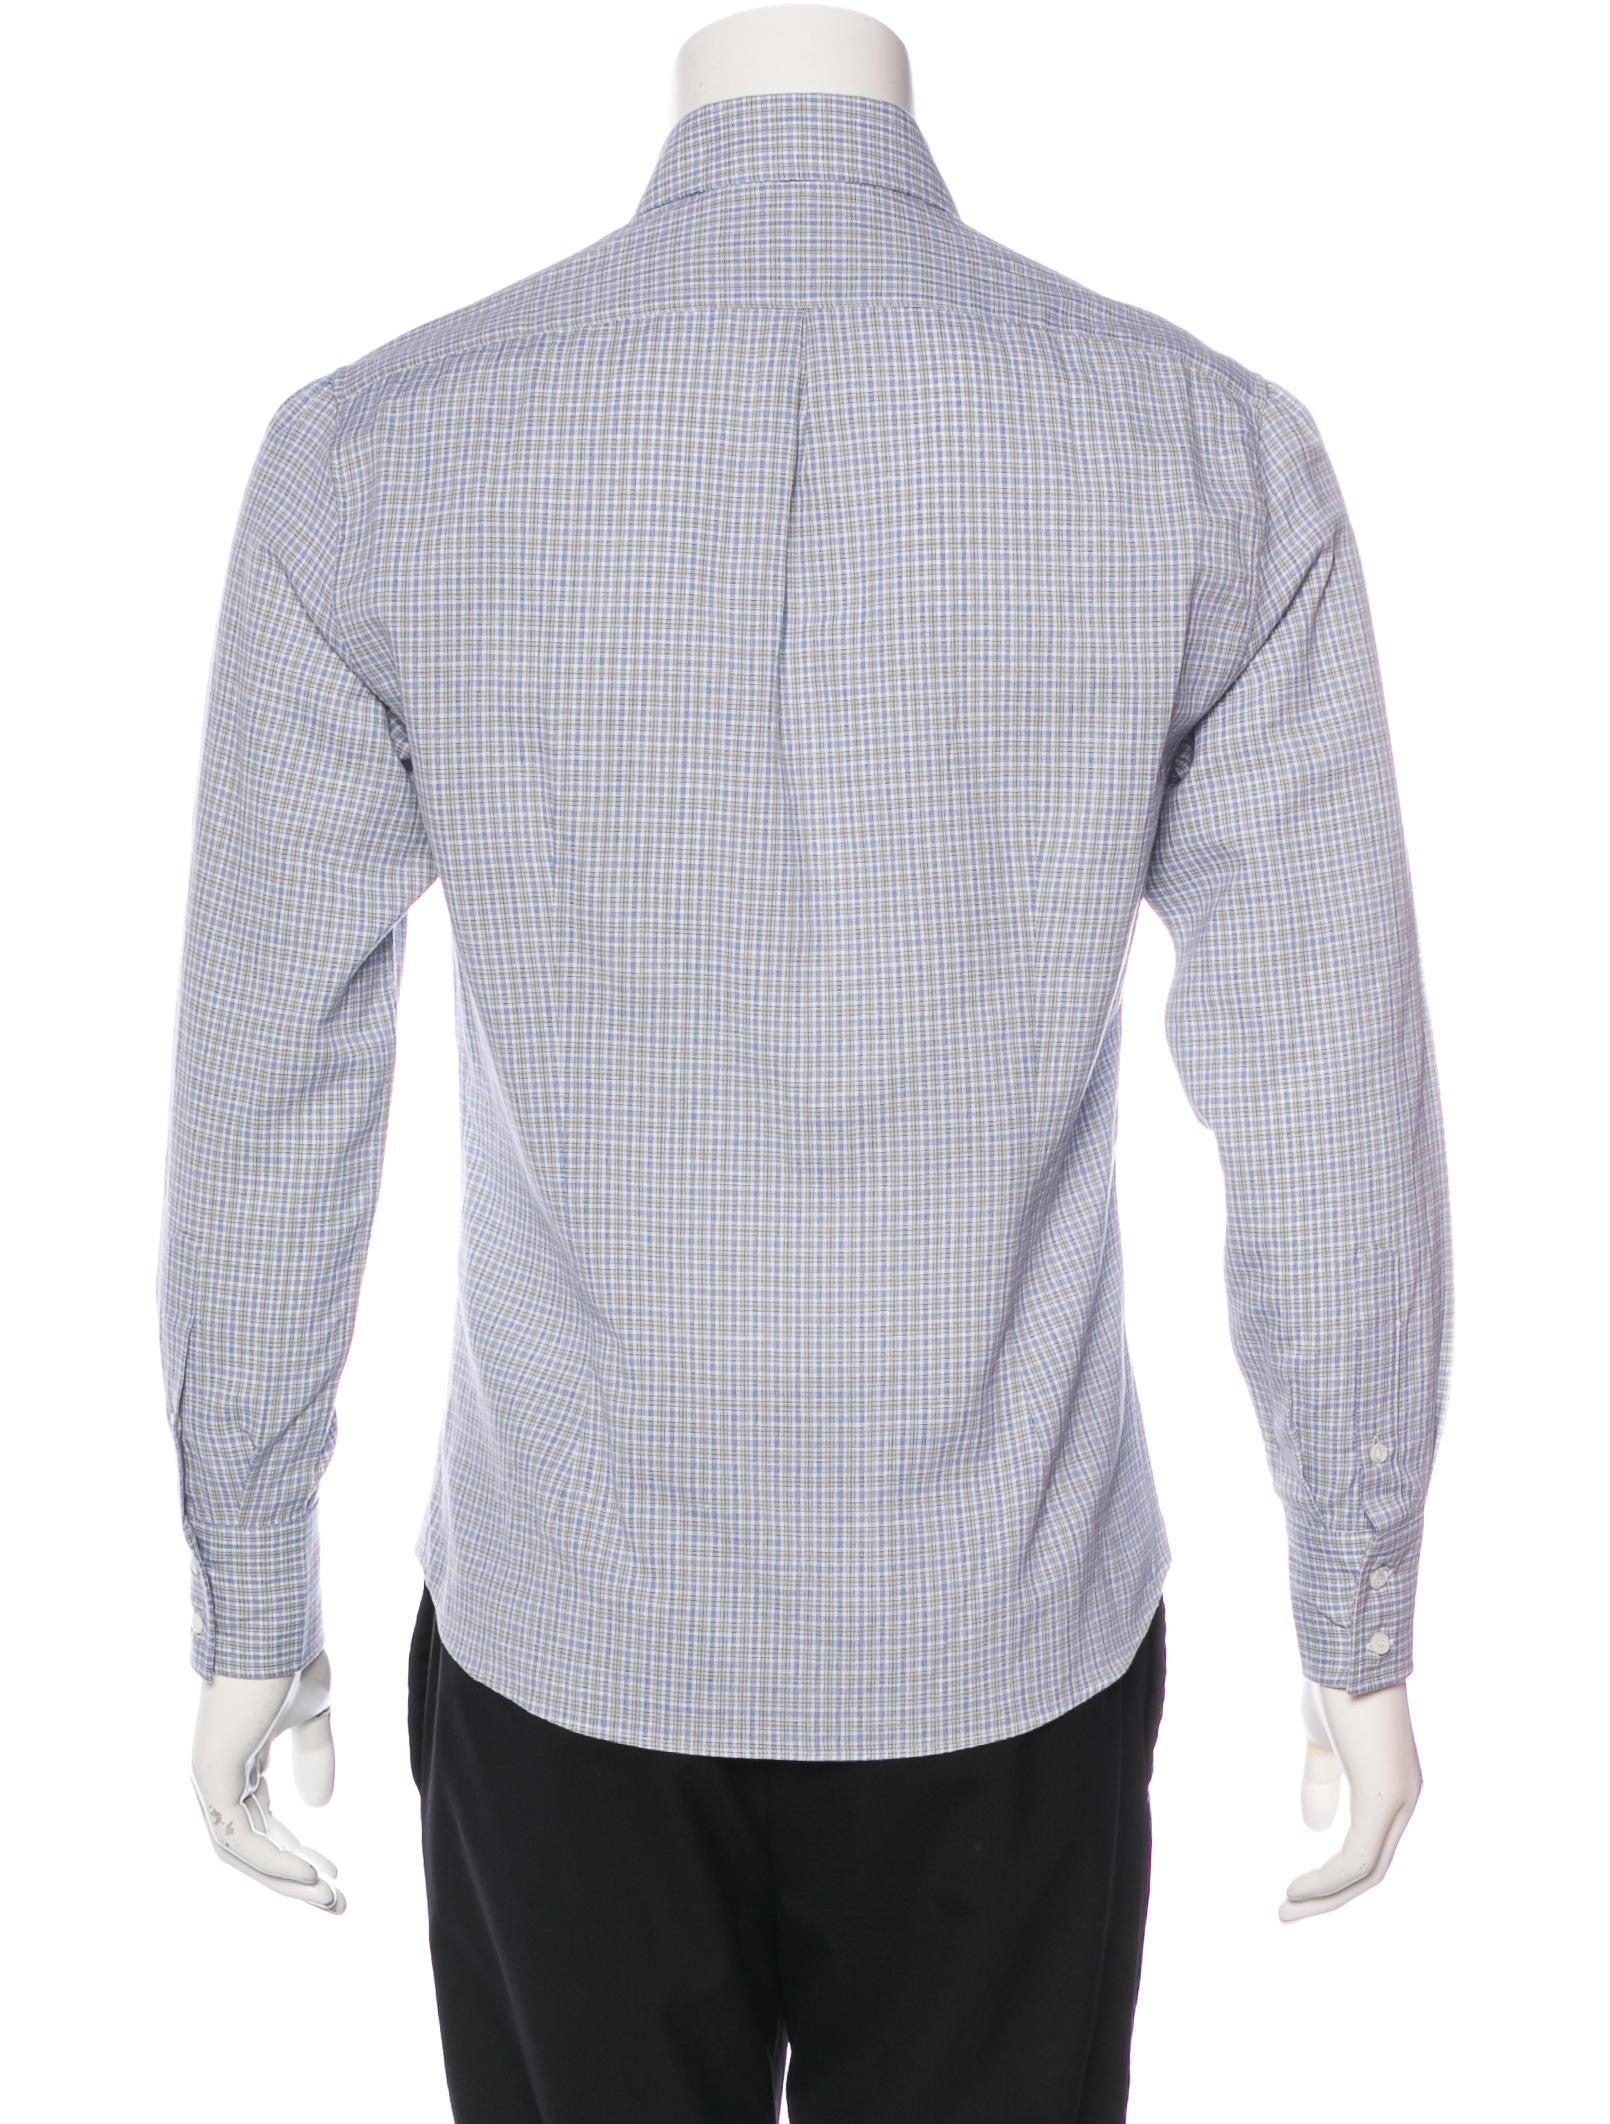 Brunello cucinelli slim fit check shirt w tags clothing for Slim fit check shirt